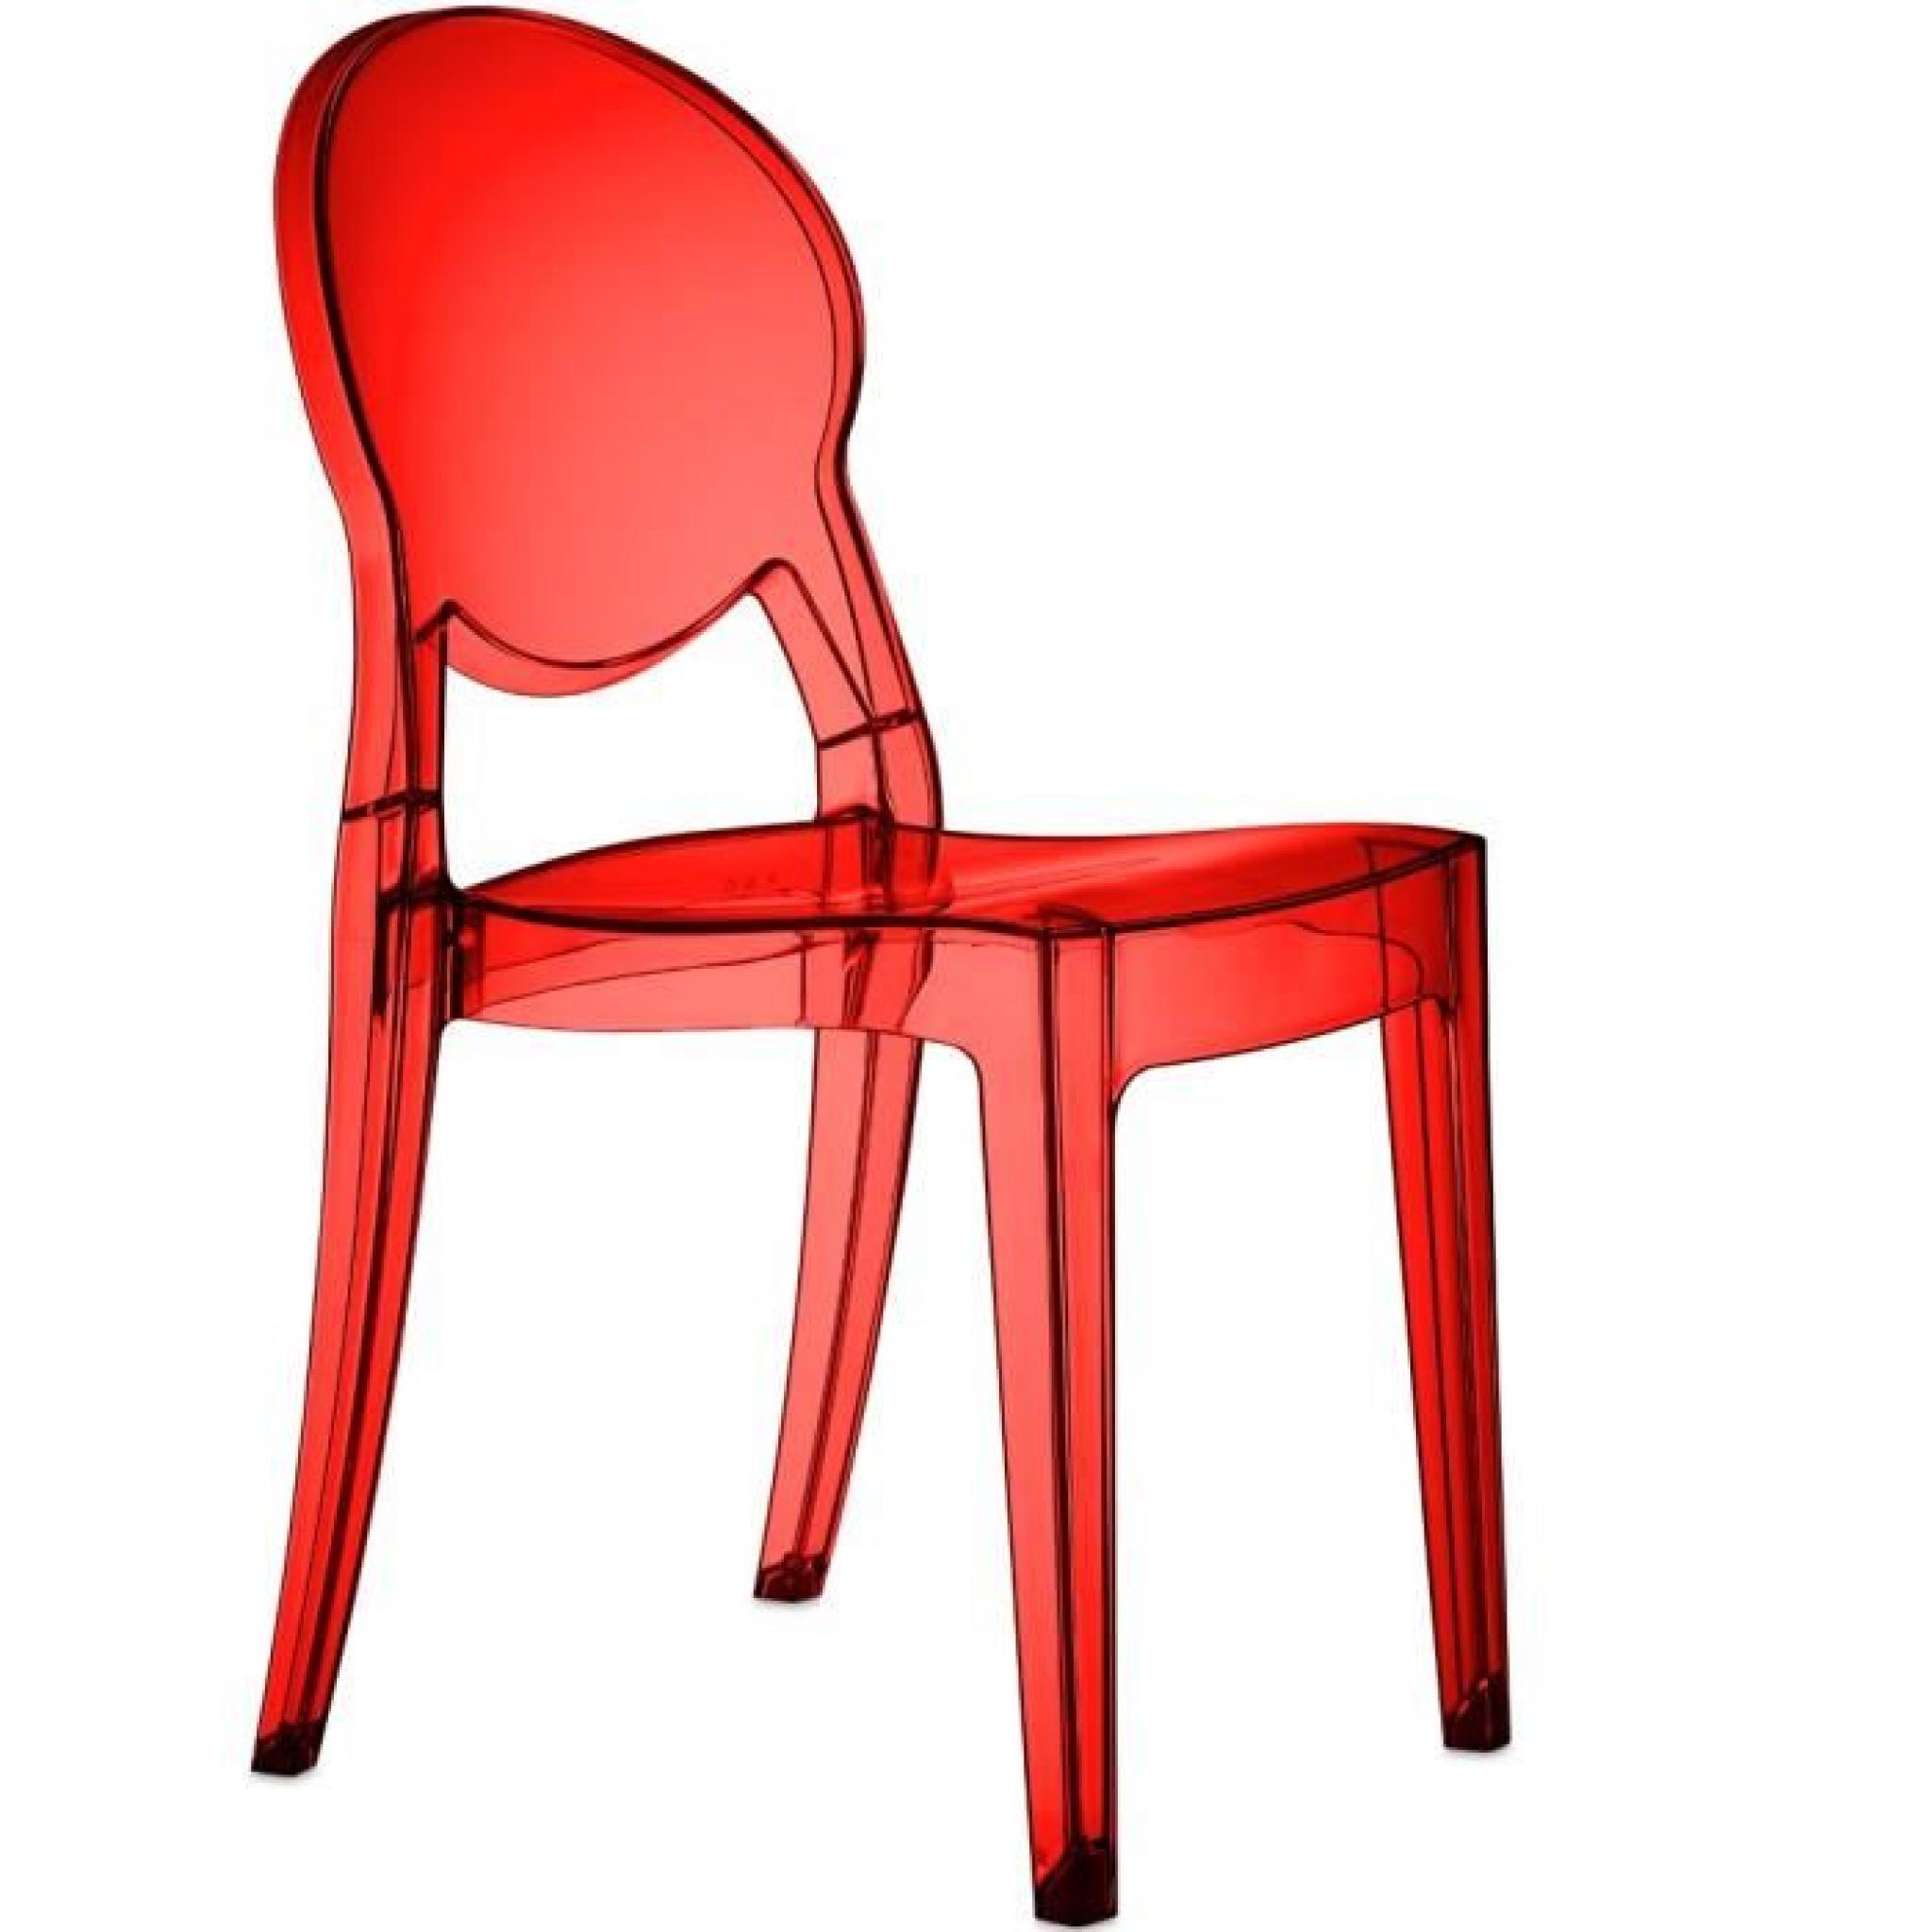 Chaise Design Rgence Rouge Couleur Matire Polycarbonate